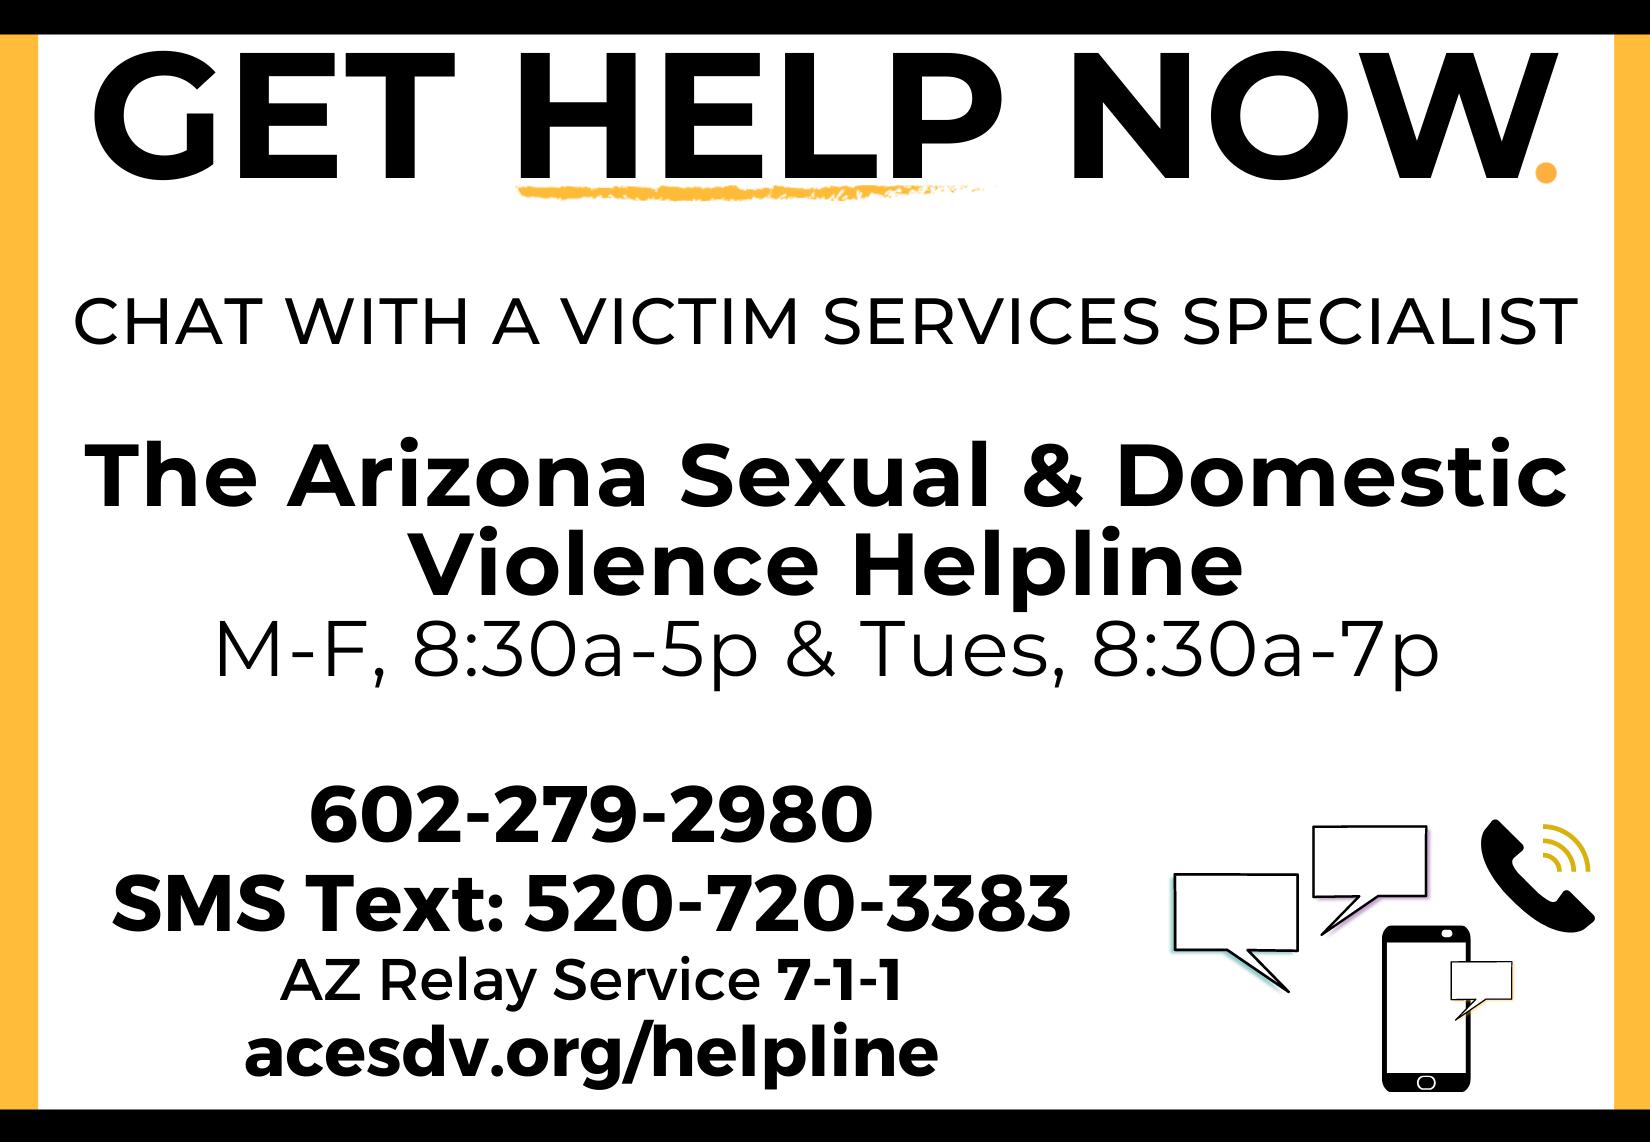 Get Help Now Helpline Numbers